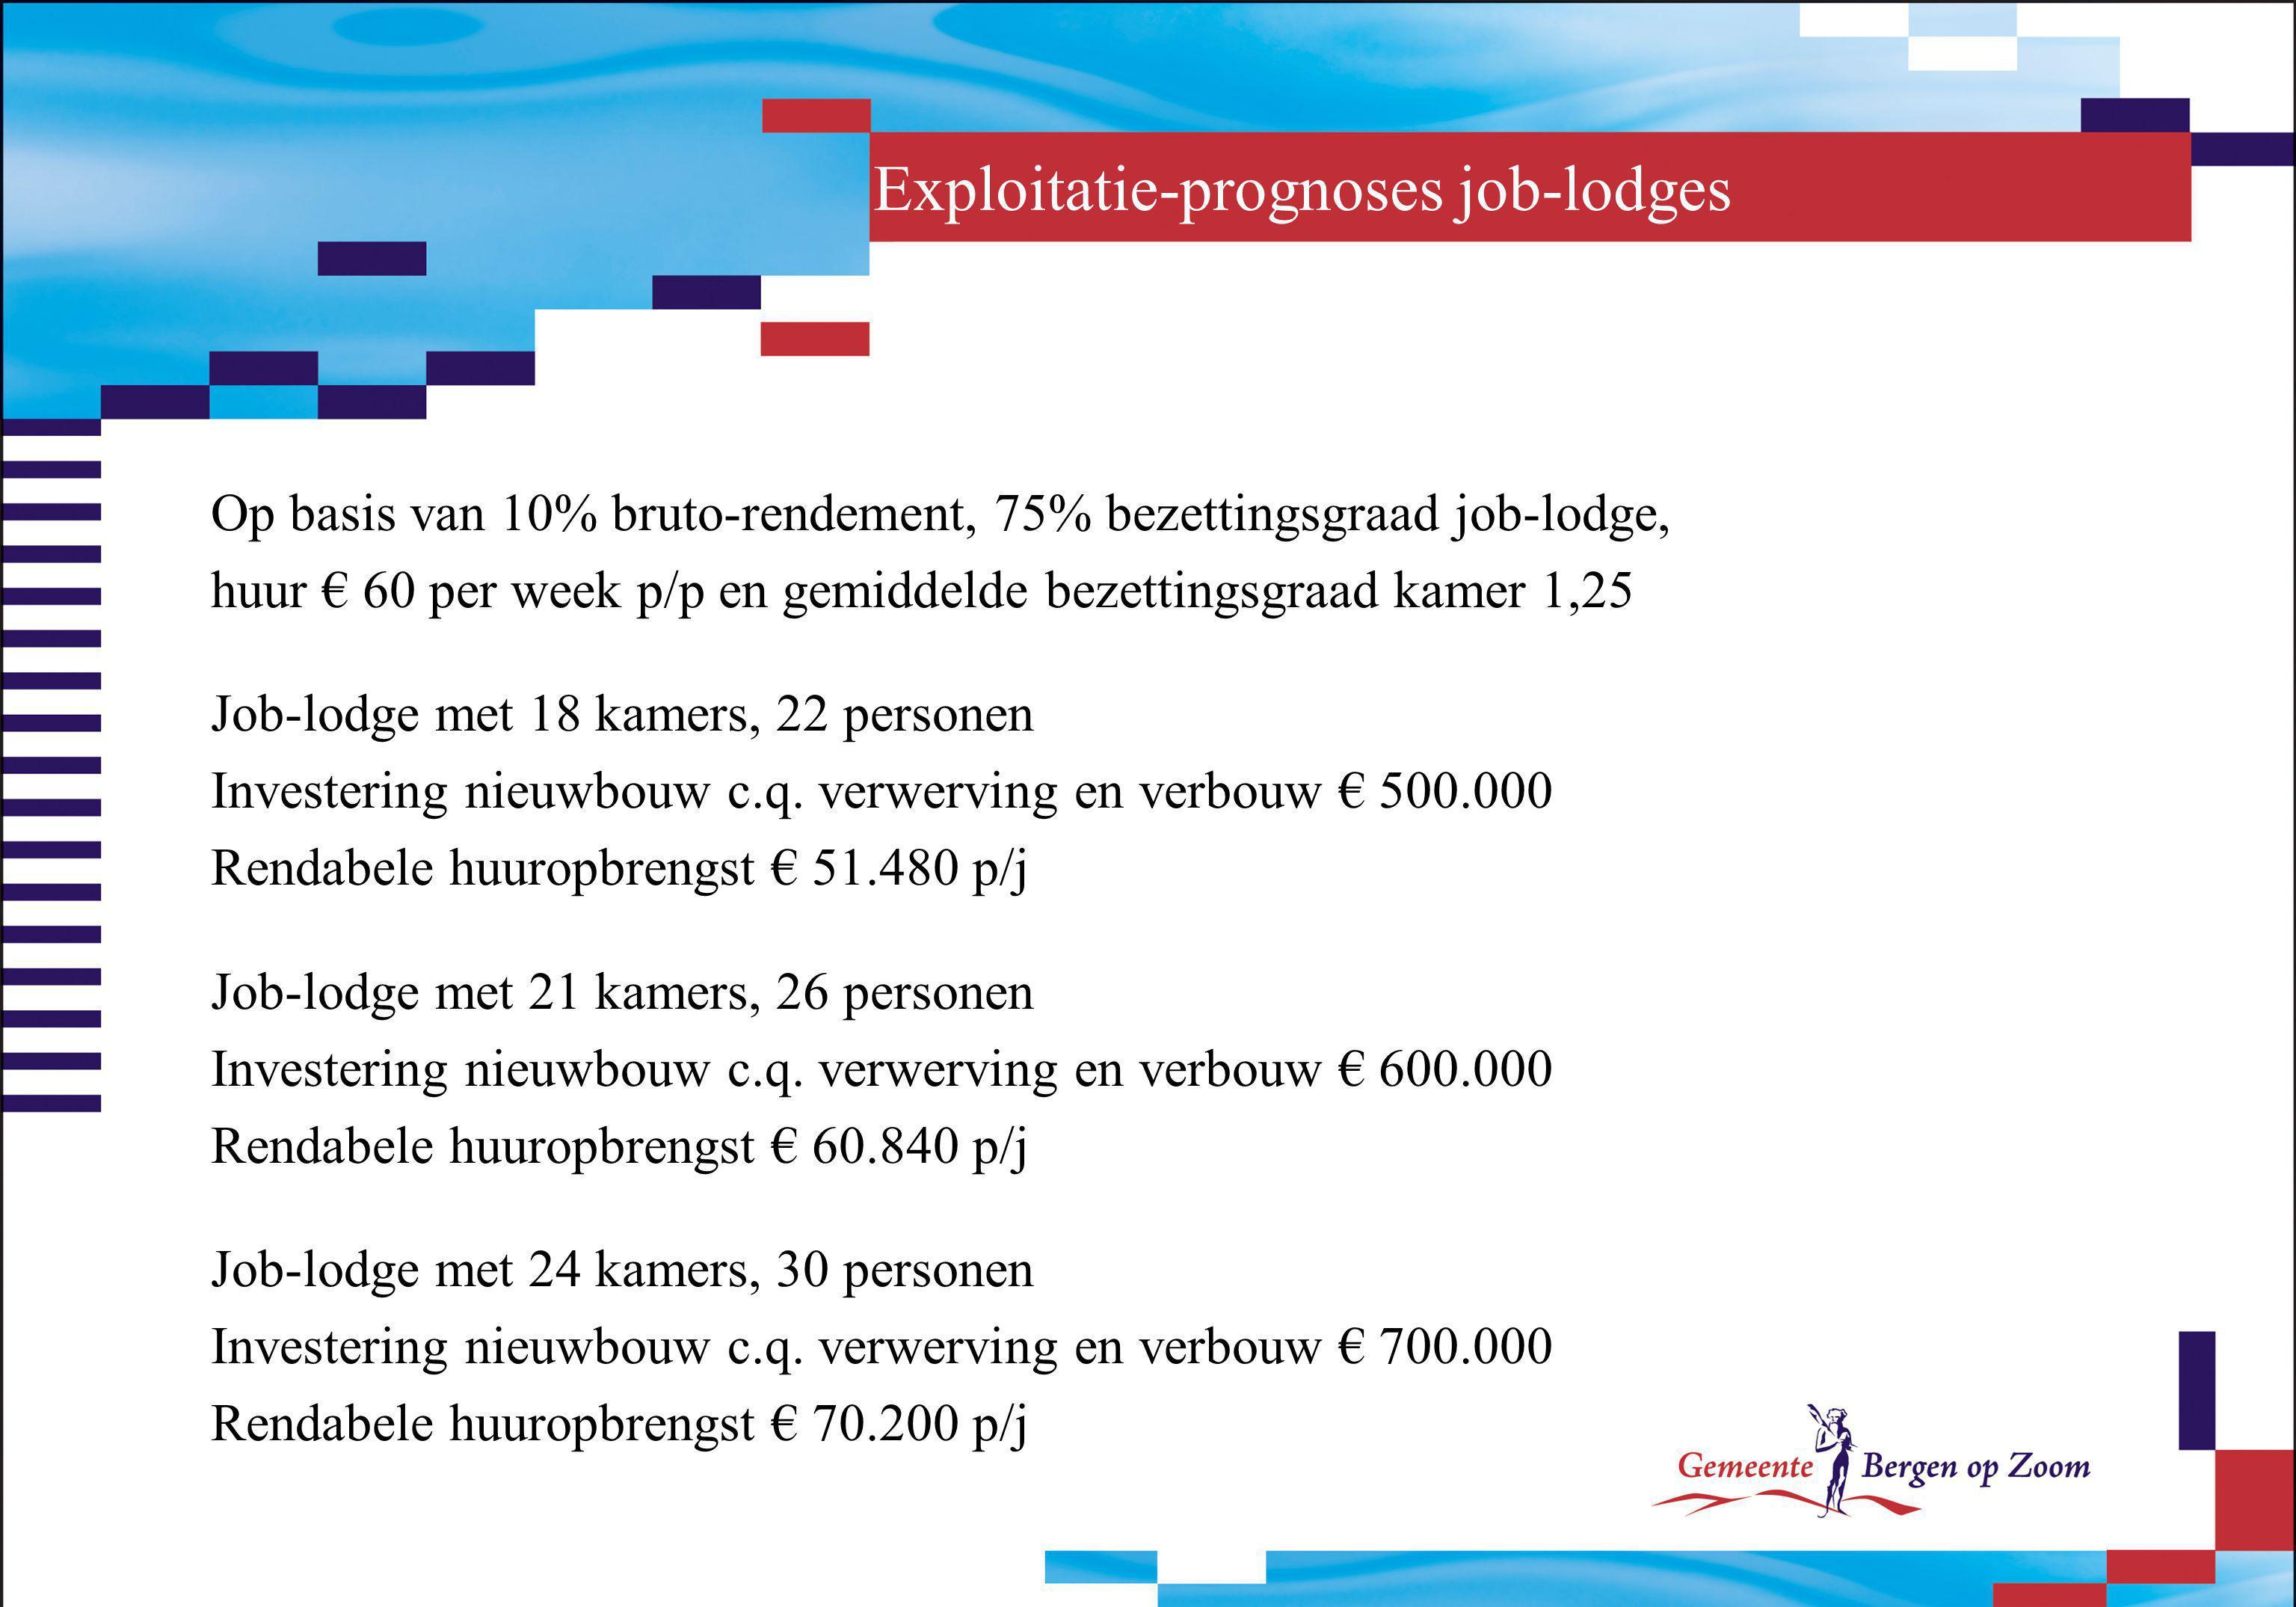 Exploitatie-prognoses job-lodges Op basis van 10% bruto-rendement, 75% bezettingsgraad job-lodge, huur € 60 per week p/p en gemiddelde bezettingsgraad